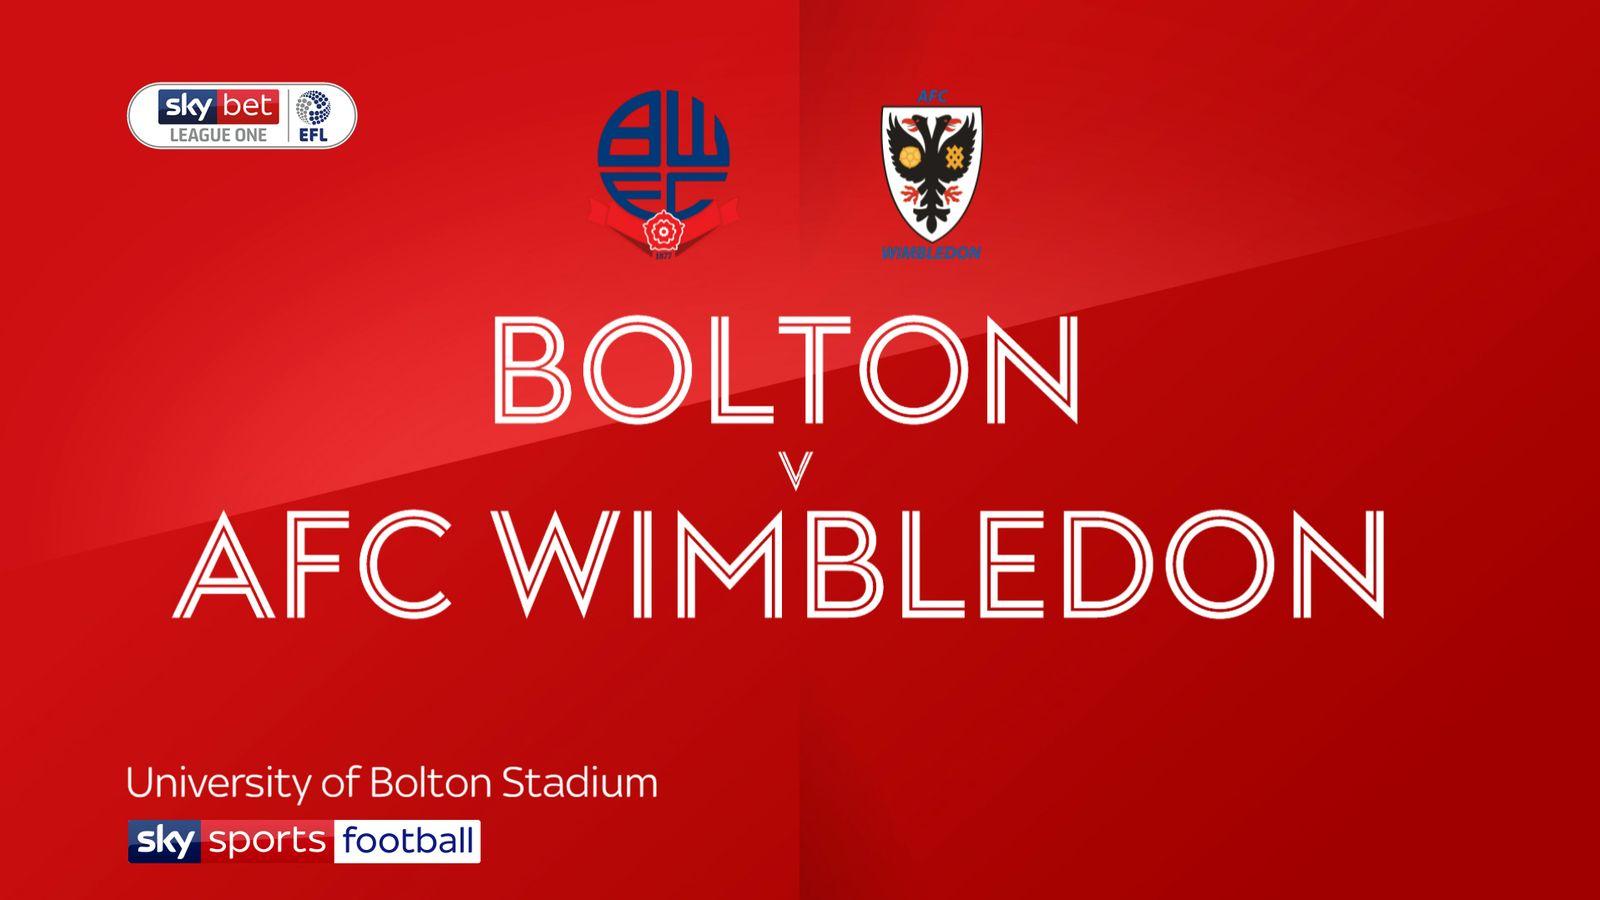 Bolton 2-2 AFC Wimbledon: Late Joe Dodoo goal snatches dramatic draw